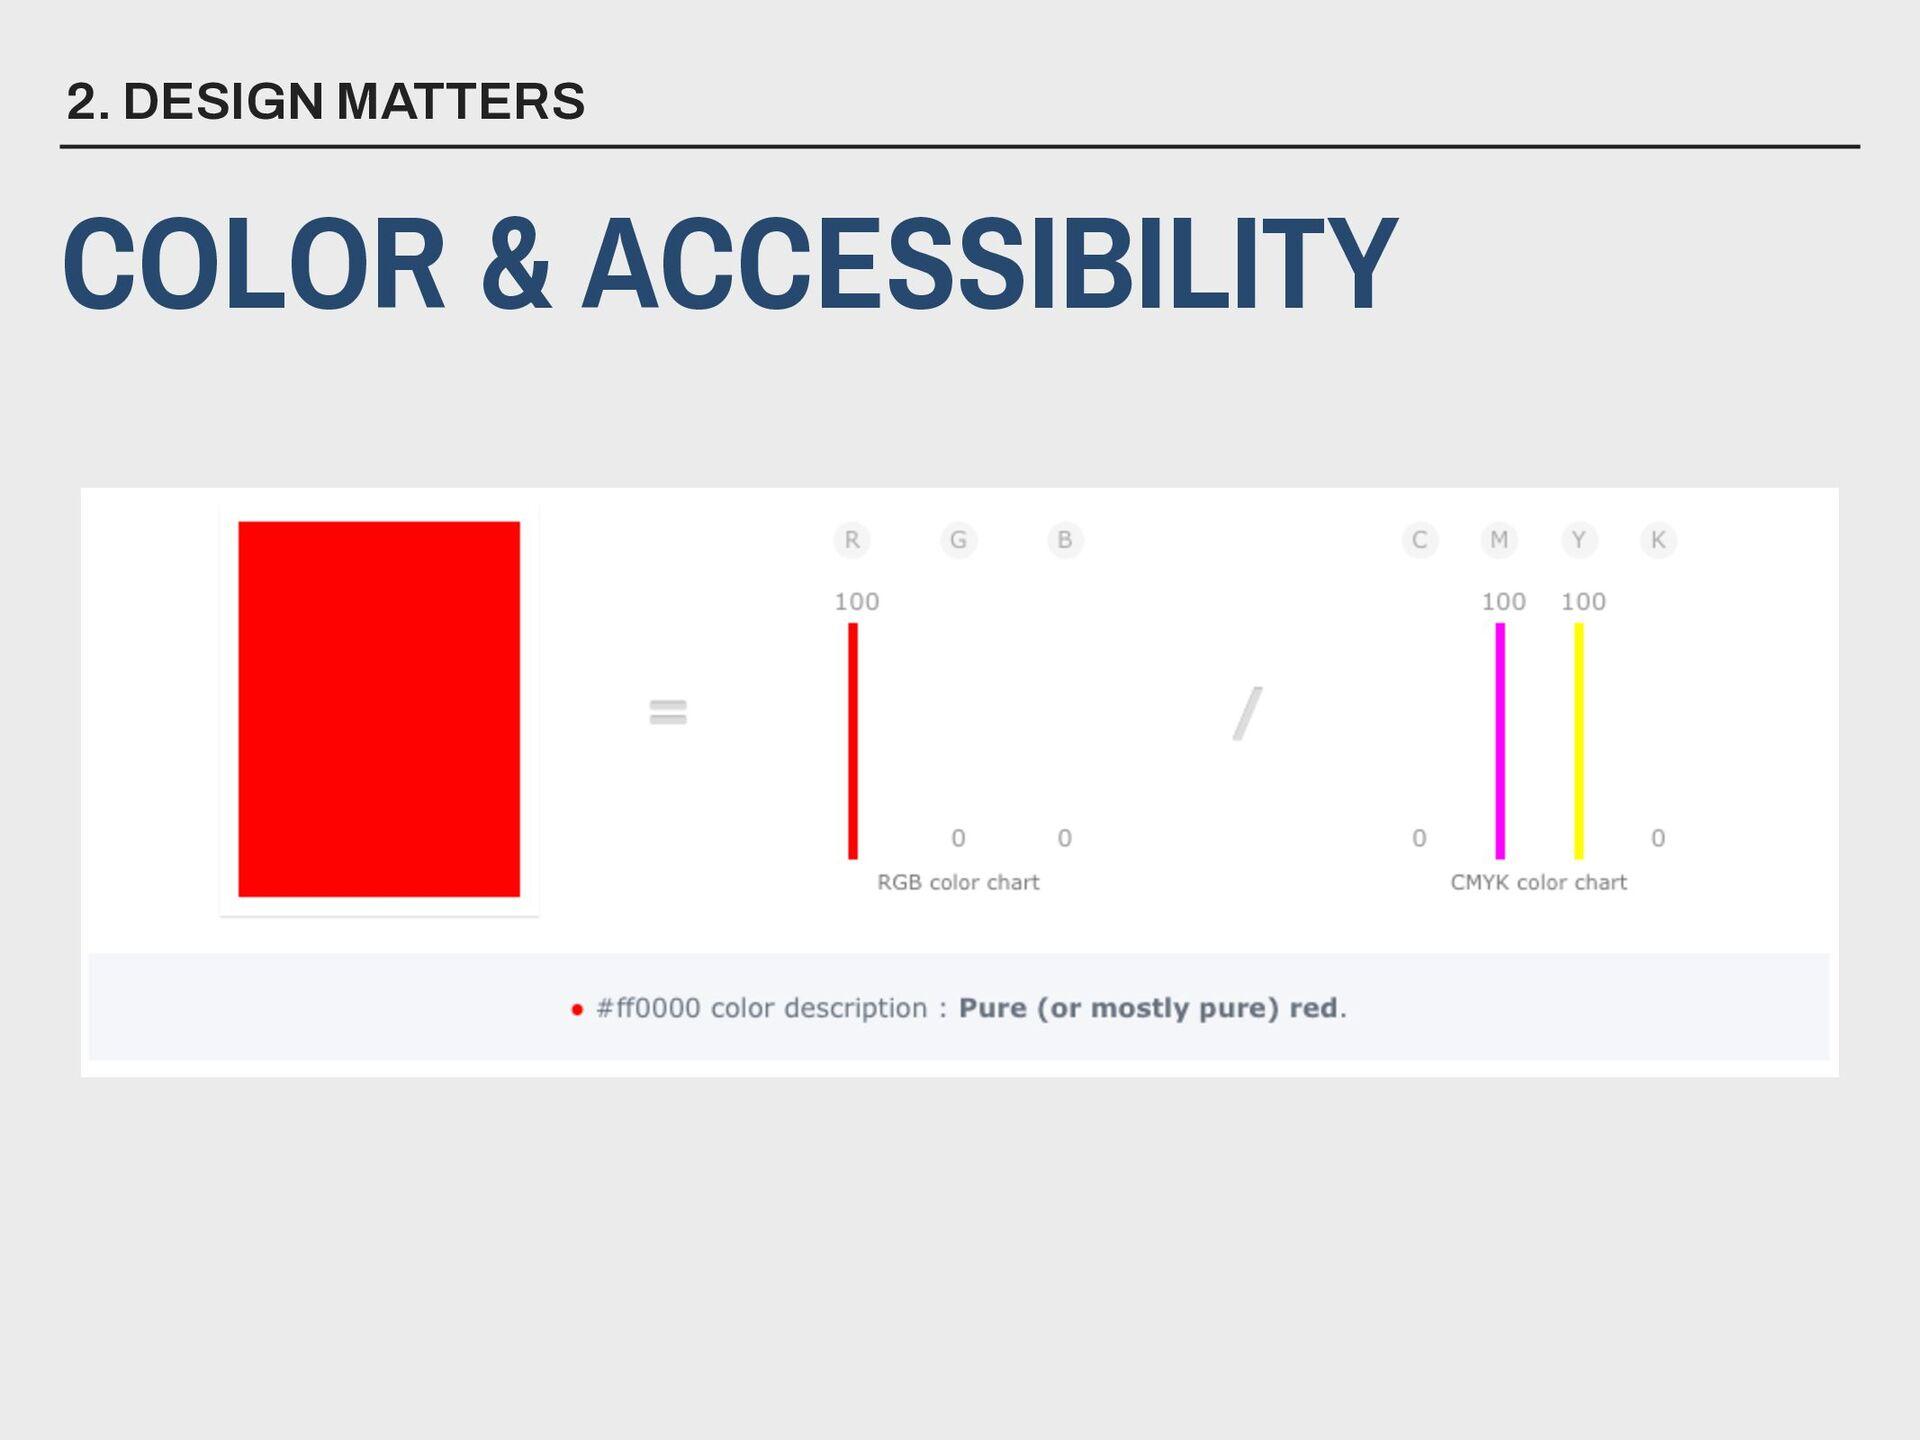 2. DESIGN MATTERS COLOR & ACCESSIBILITY